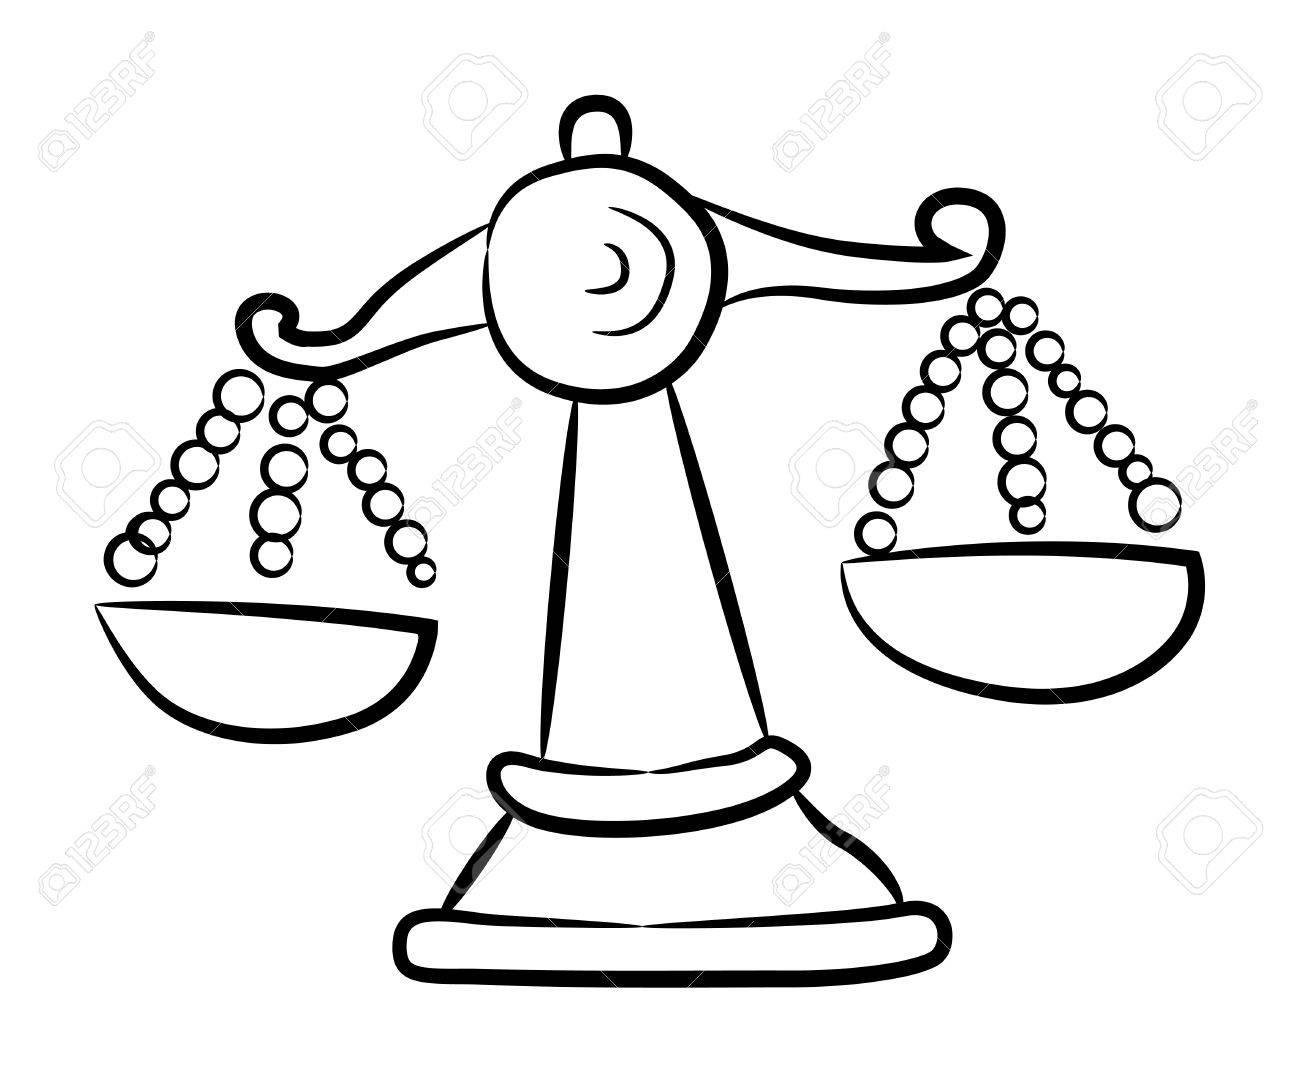 1300x1070 Cartoon Image Of Scales Icon. Balance Symbol Royalty Free Cliparts